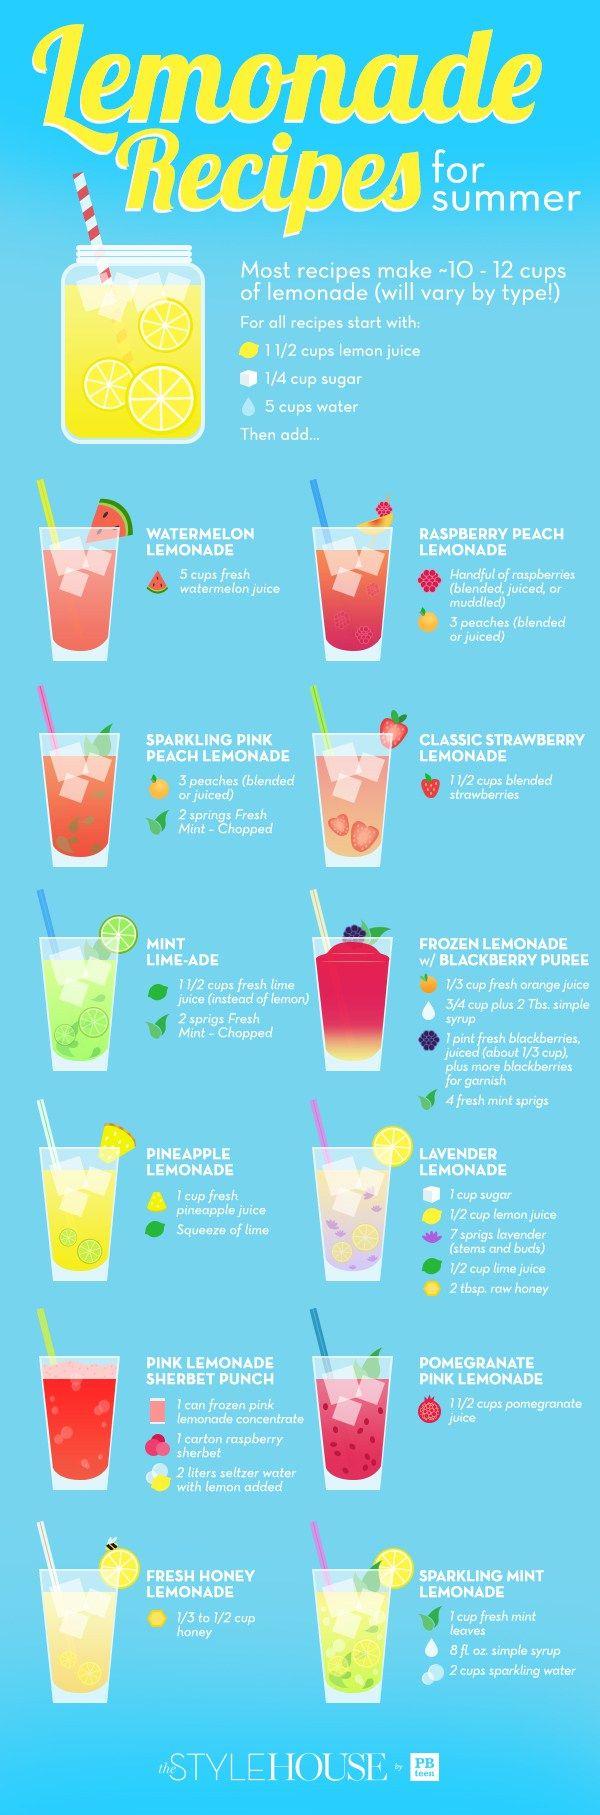 12 Unique Lemonade Recipes For Summer - Pottery Barn